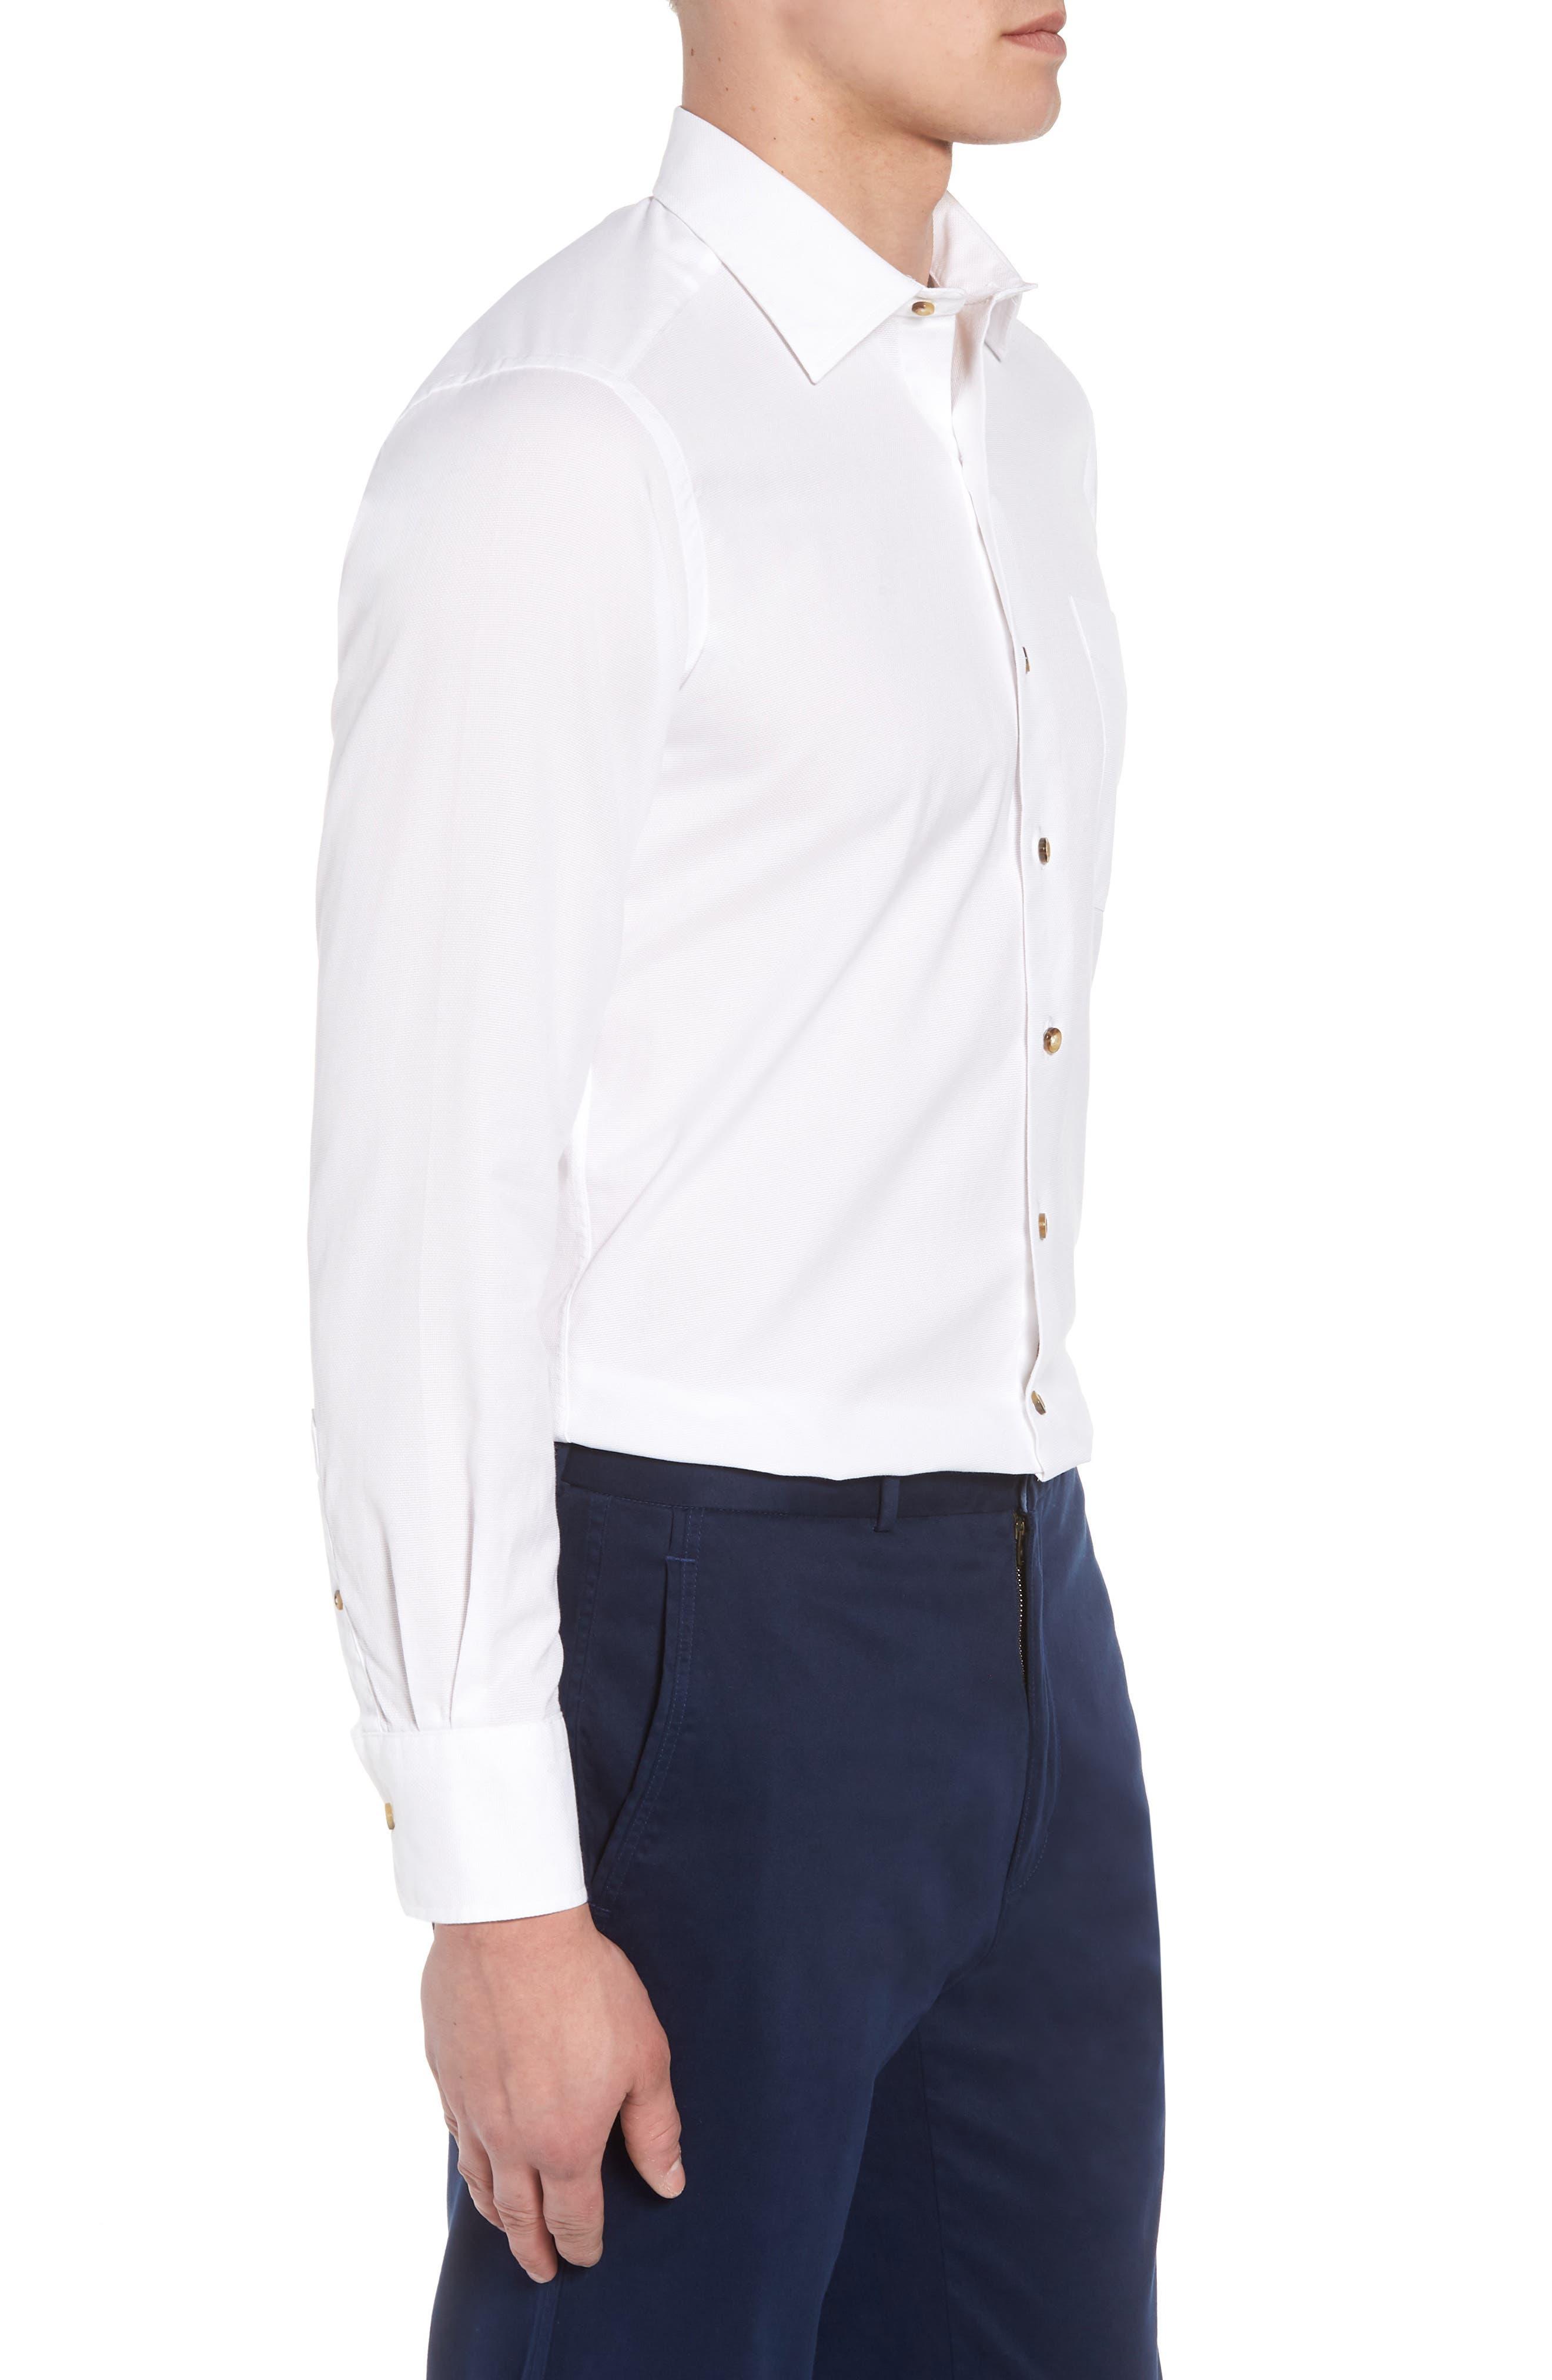 Regular Fit Garment Washed Sport Shirt,                             Alternate thumbnail 3, color,                             White